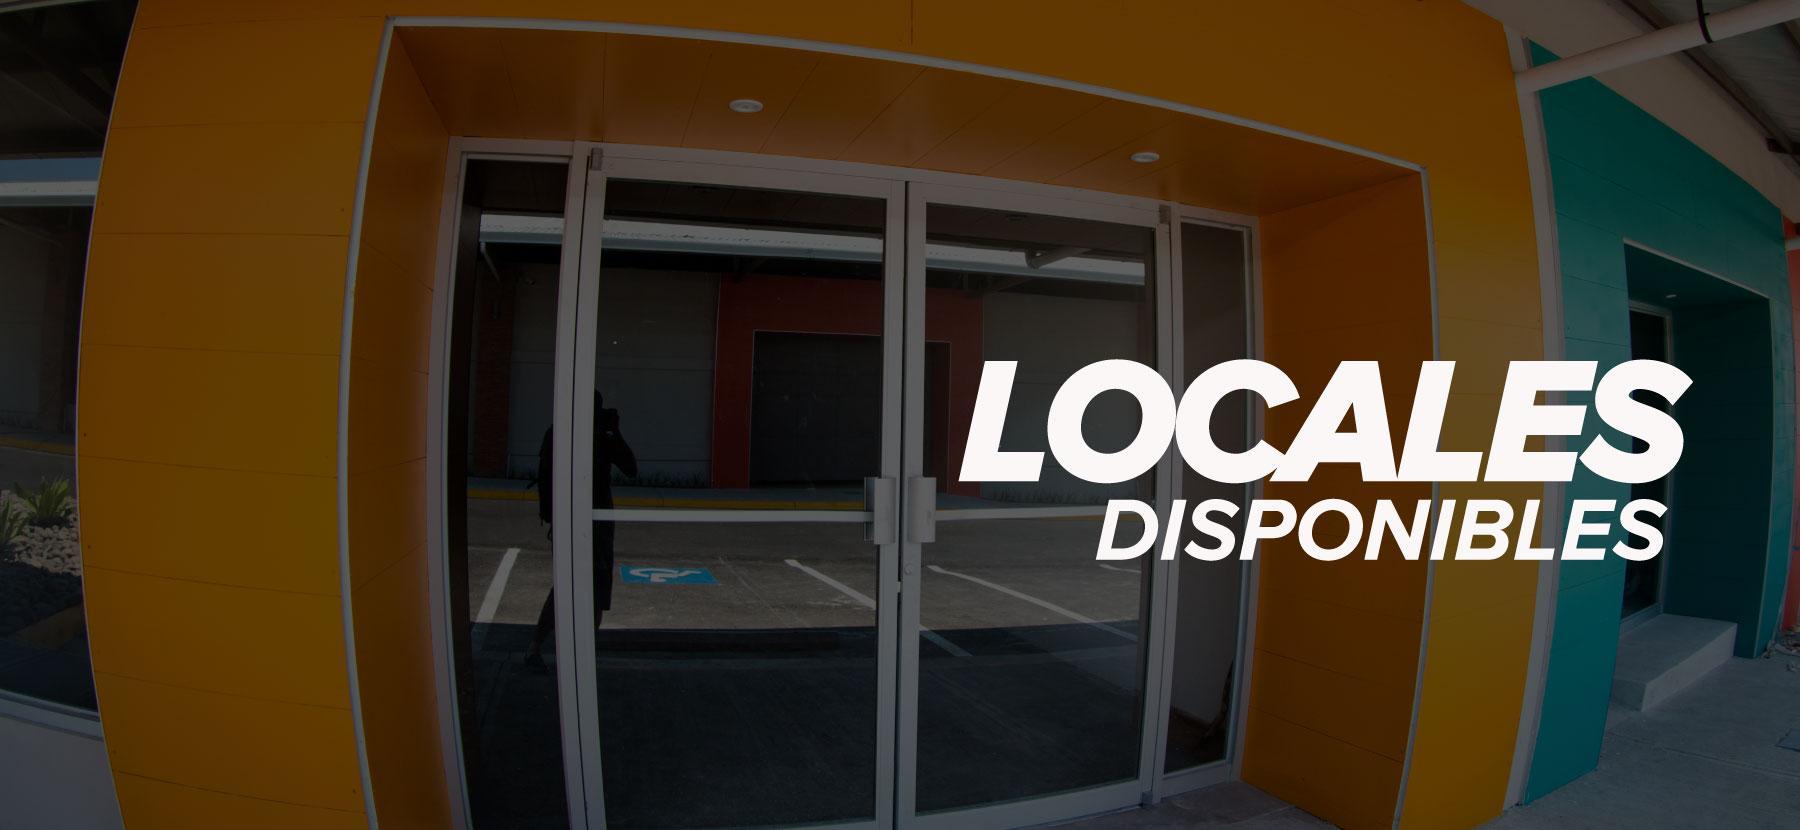 Banner Zona 5 - Locales disponibles